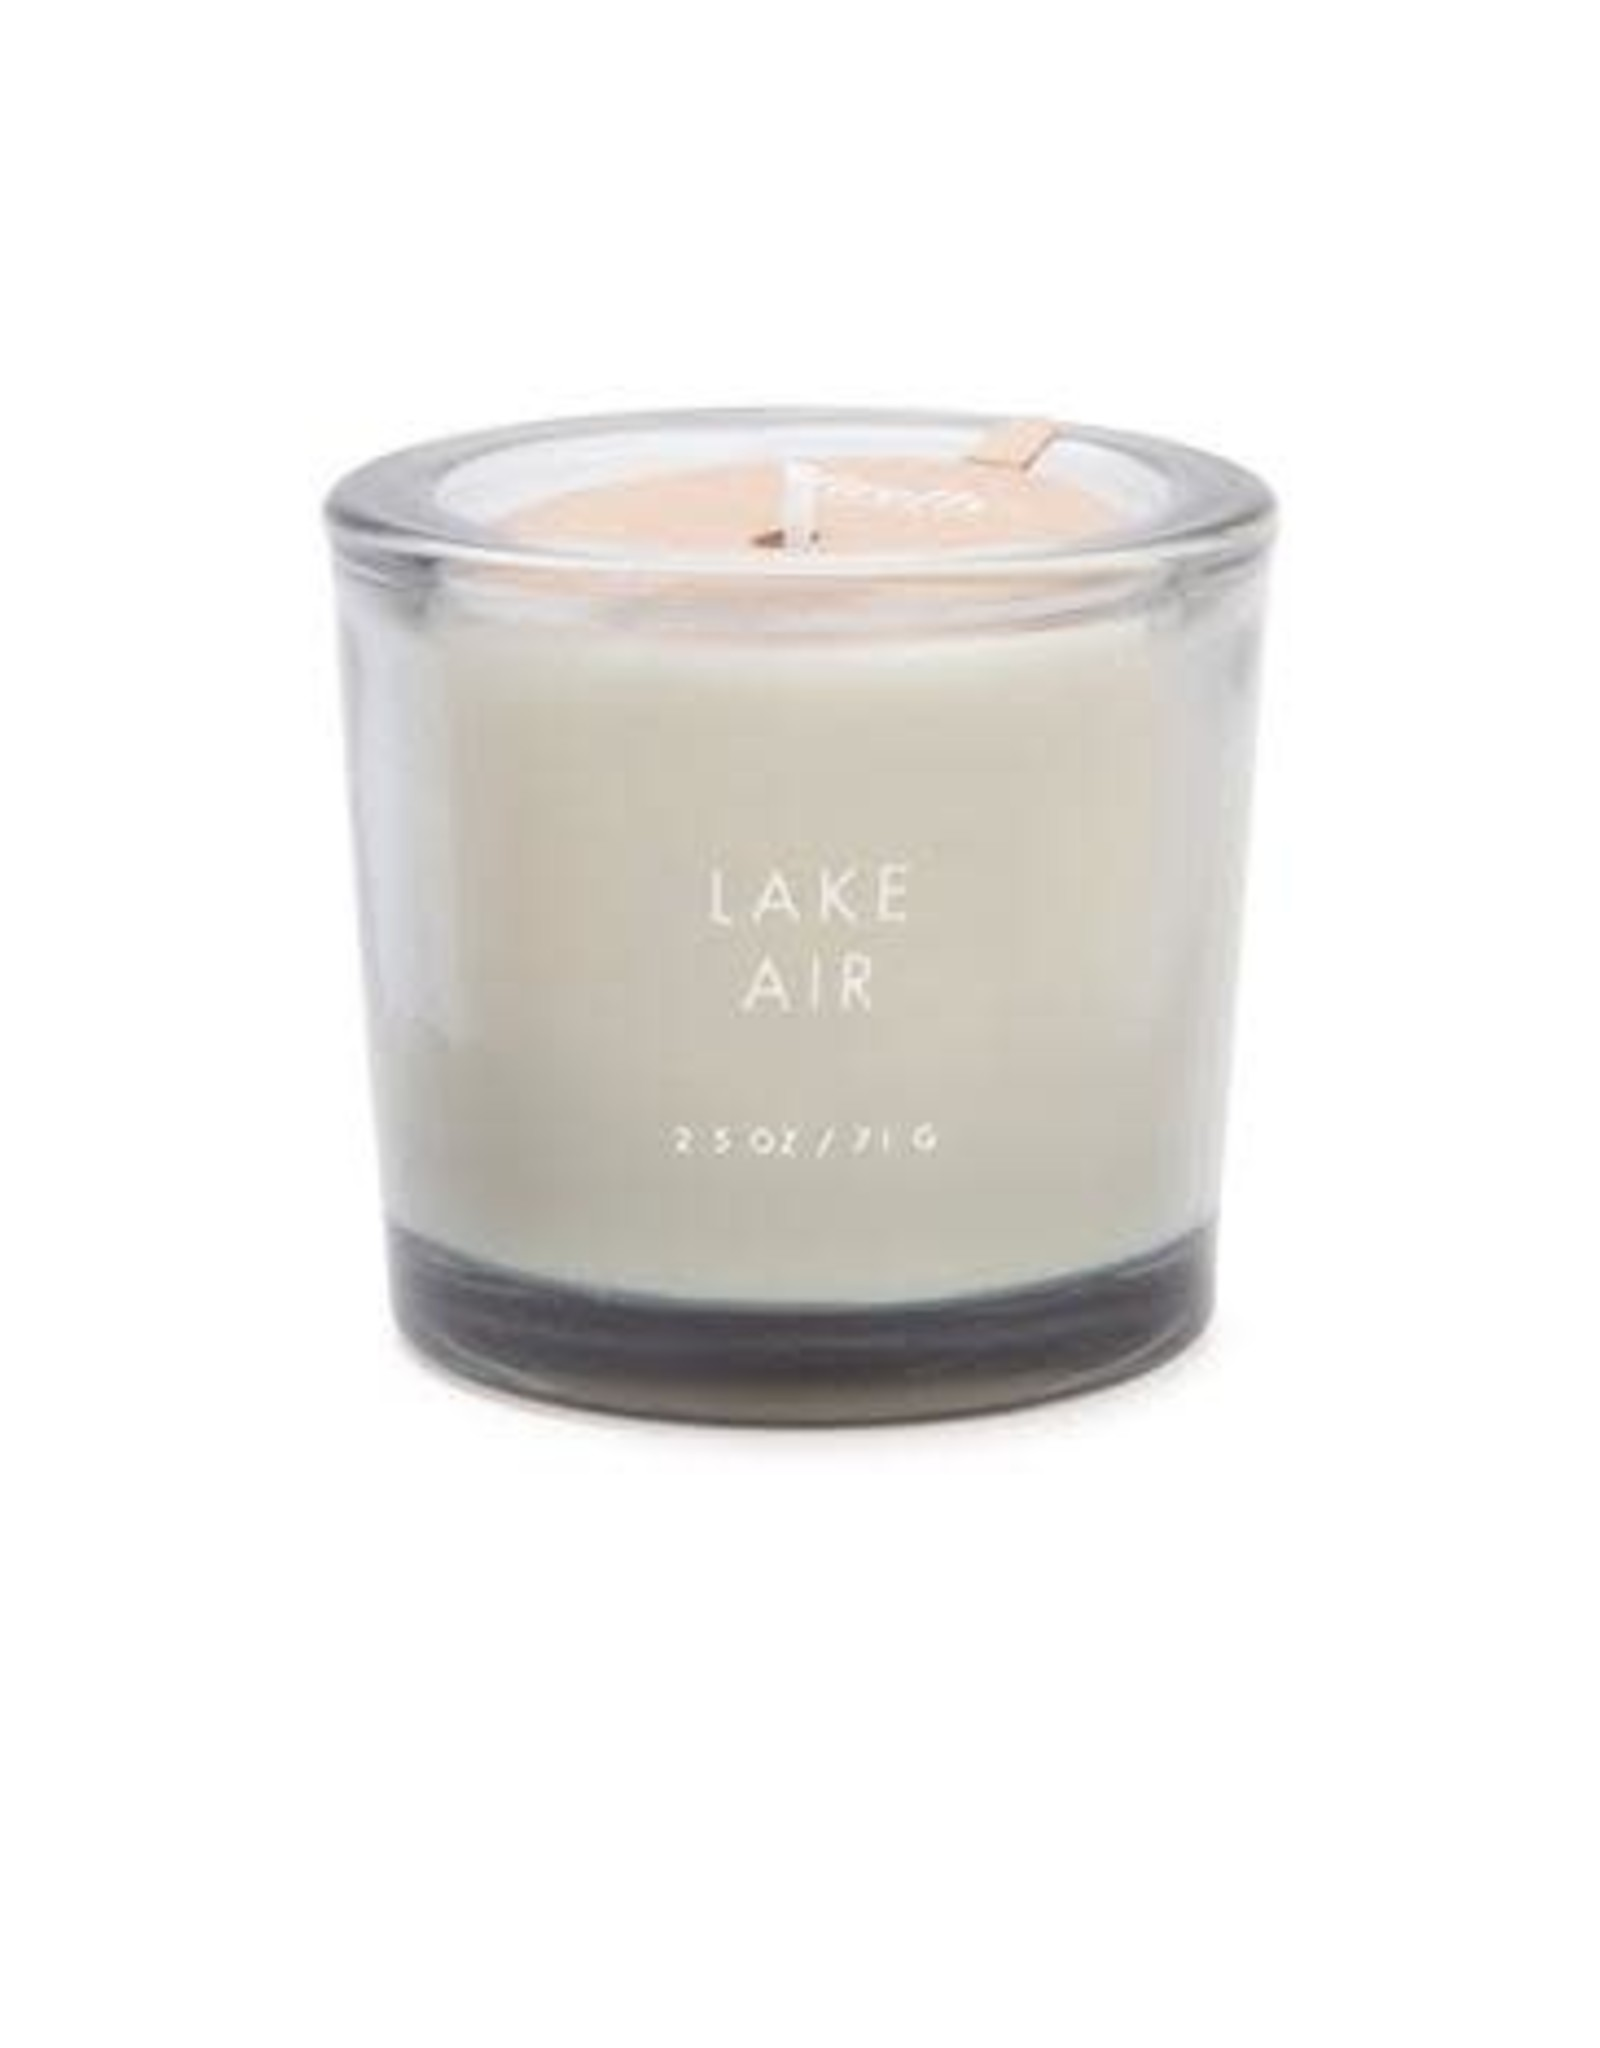 Firefly Botany Votive Candle - Lake Air 2.5 oz.